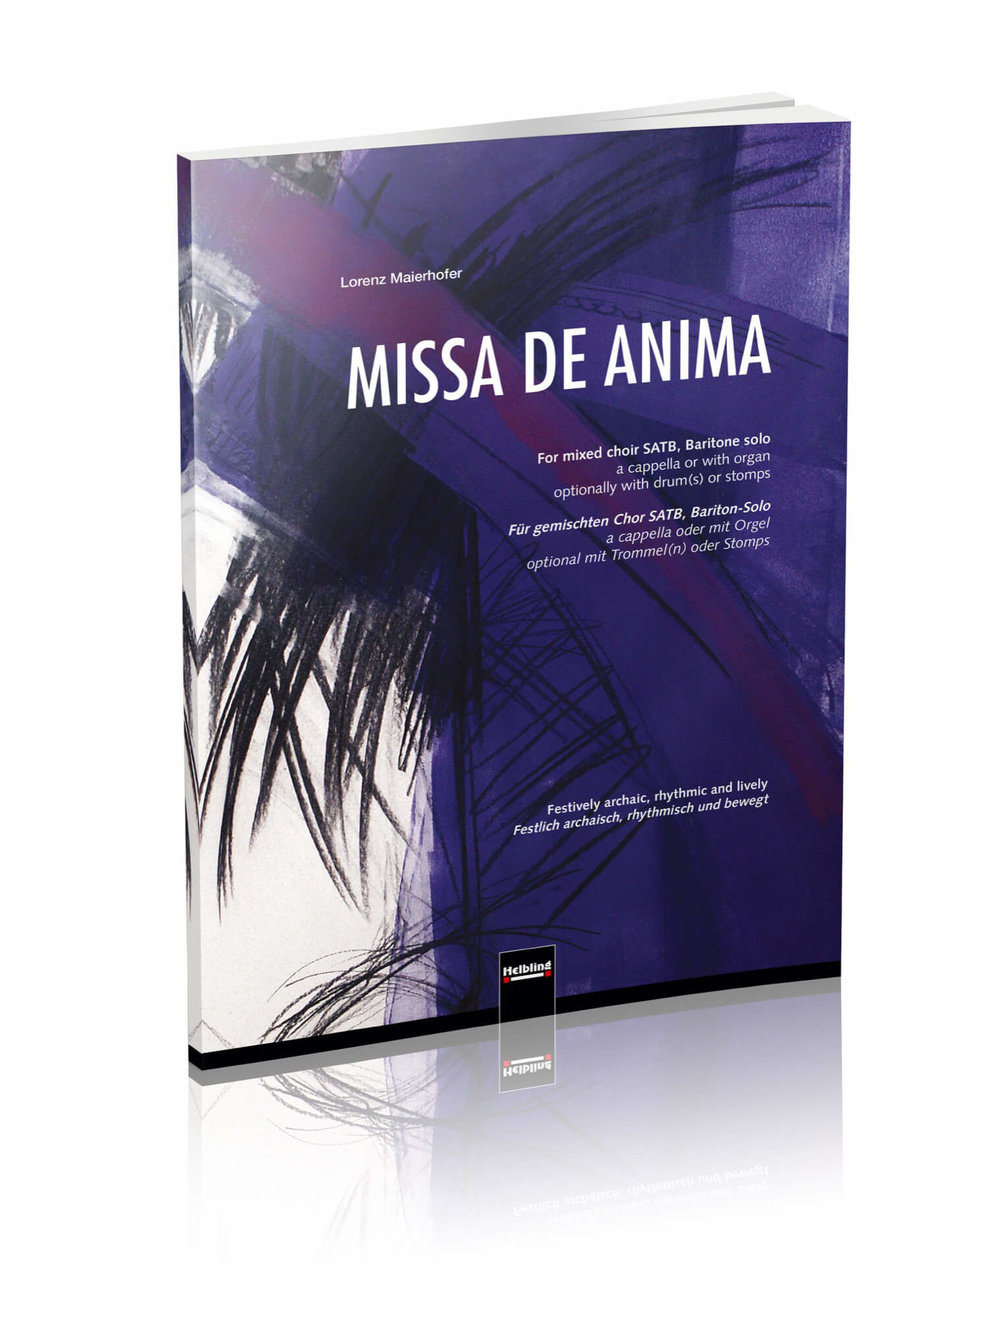 ▸ MISSA DE ANIMA